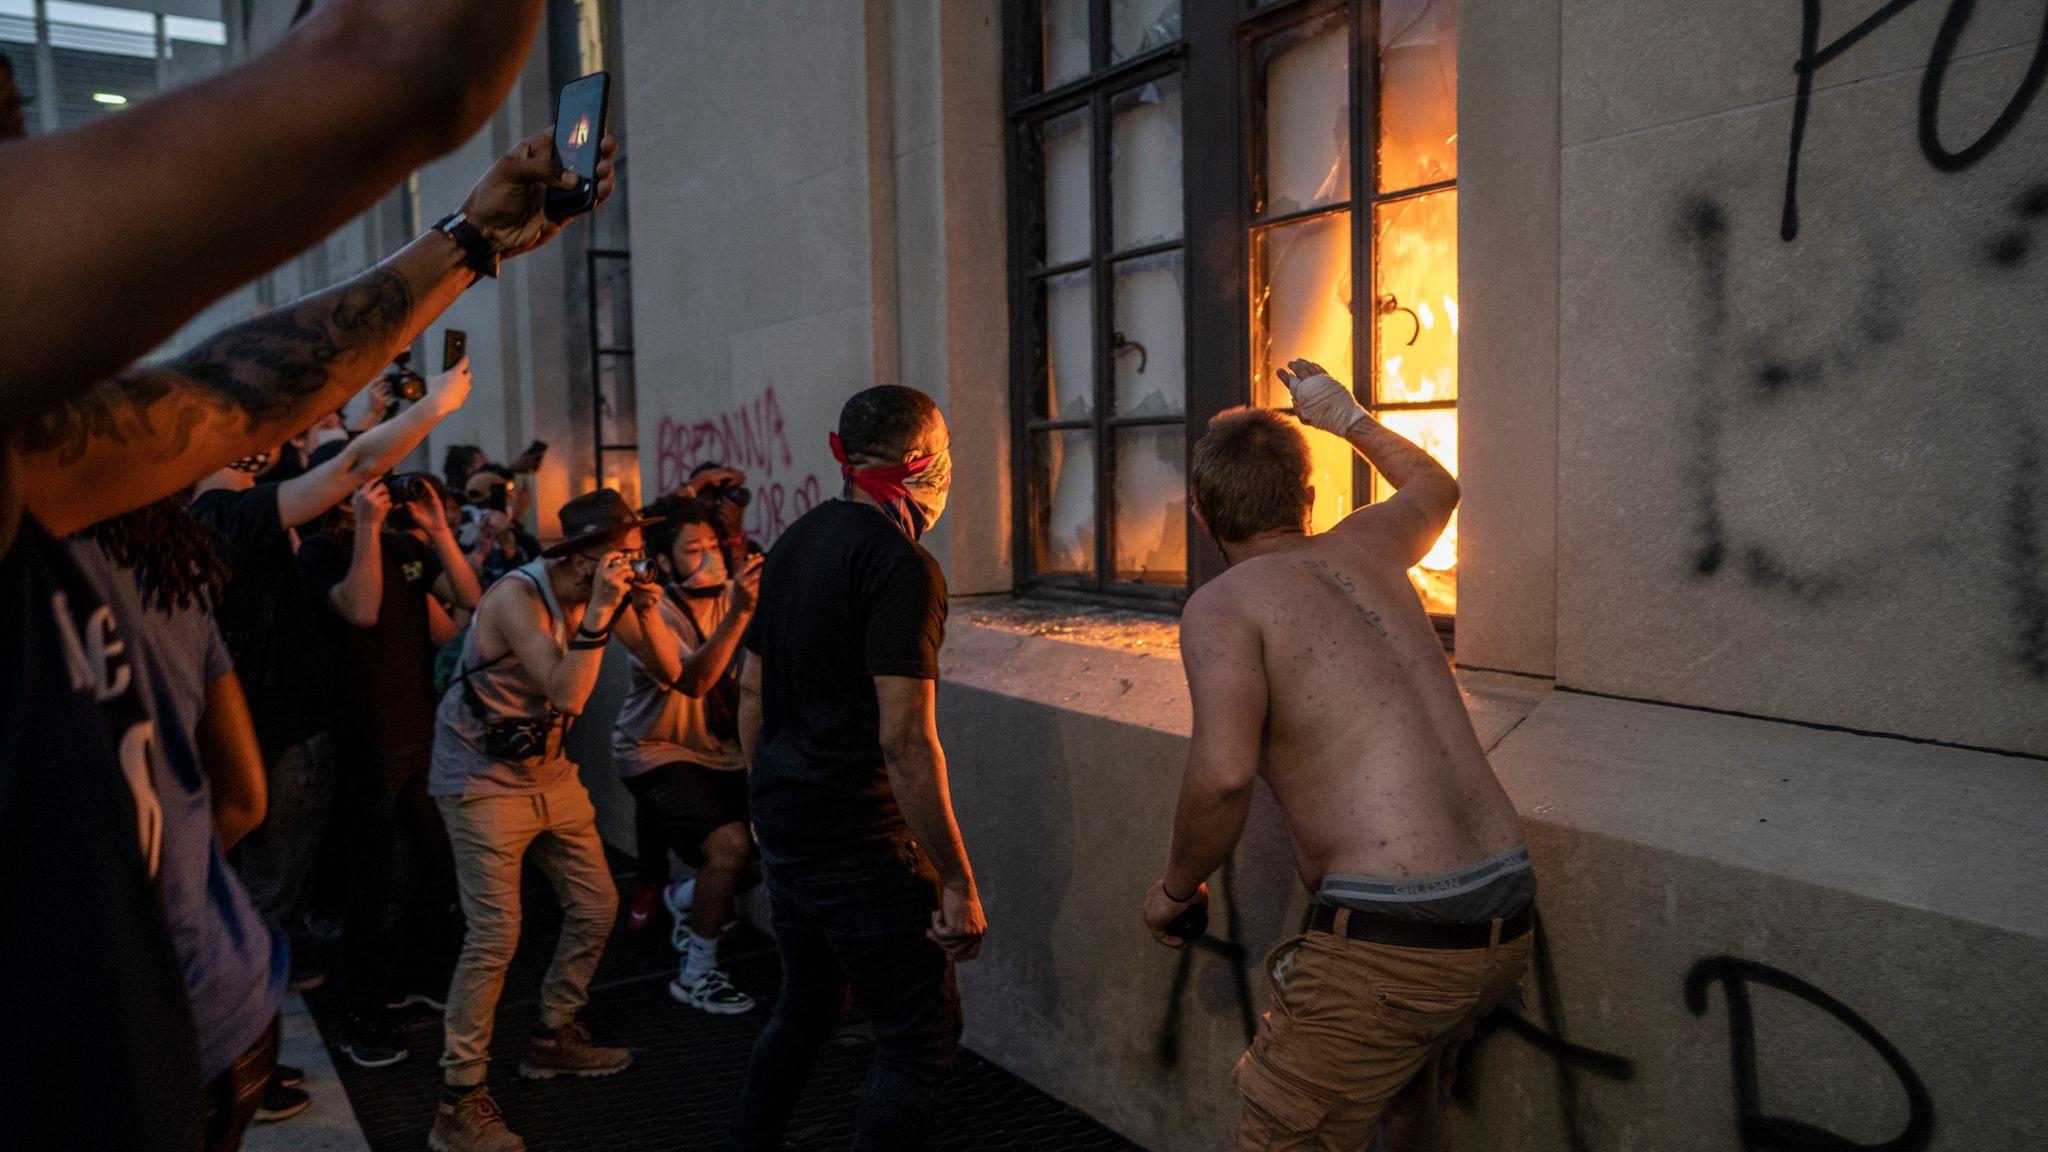 Nashville, Tenn. - A crowd outside Historic Metro Nashville Courthouse looks at fires inside the building. (Photo: John Partipilo)